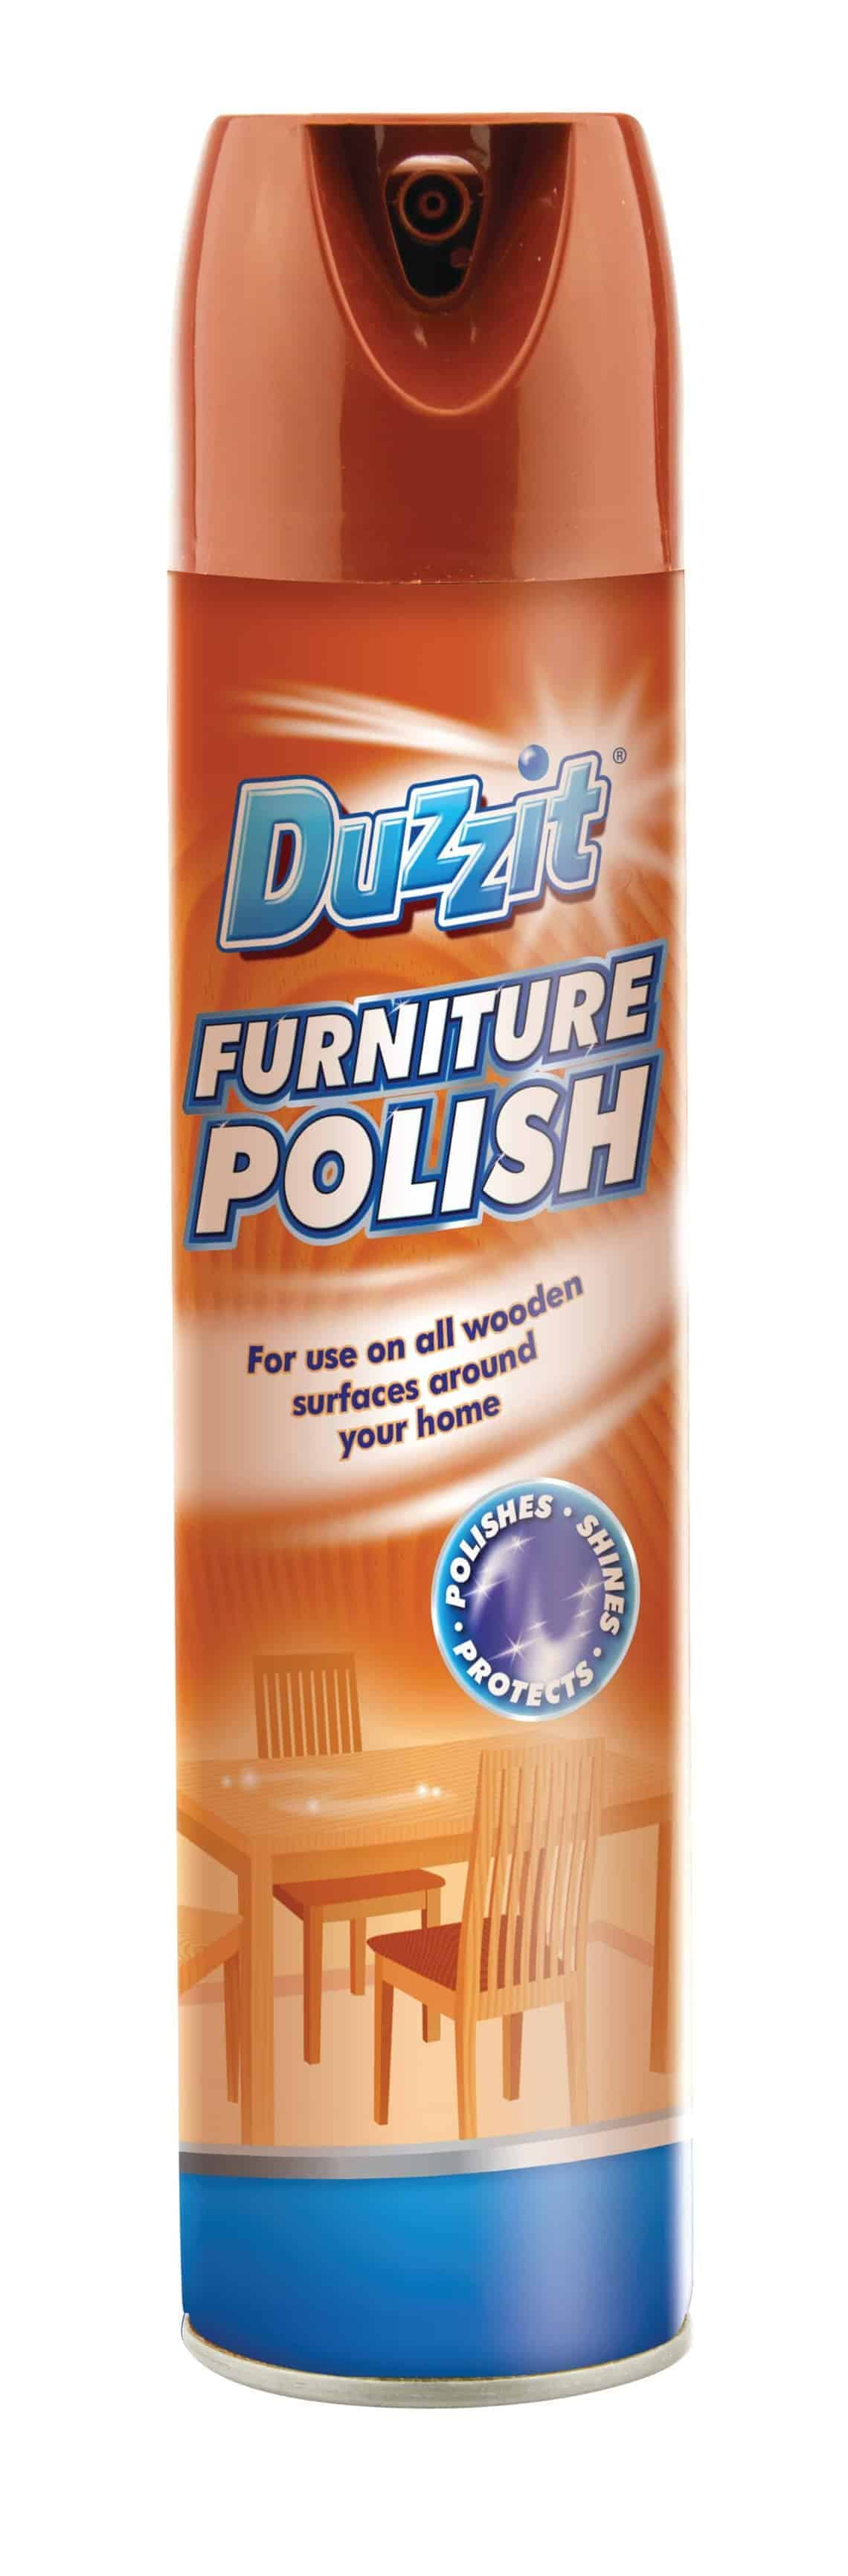 Duzzit Furniture Polish